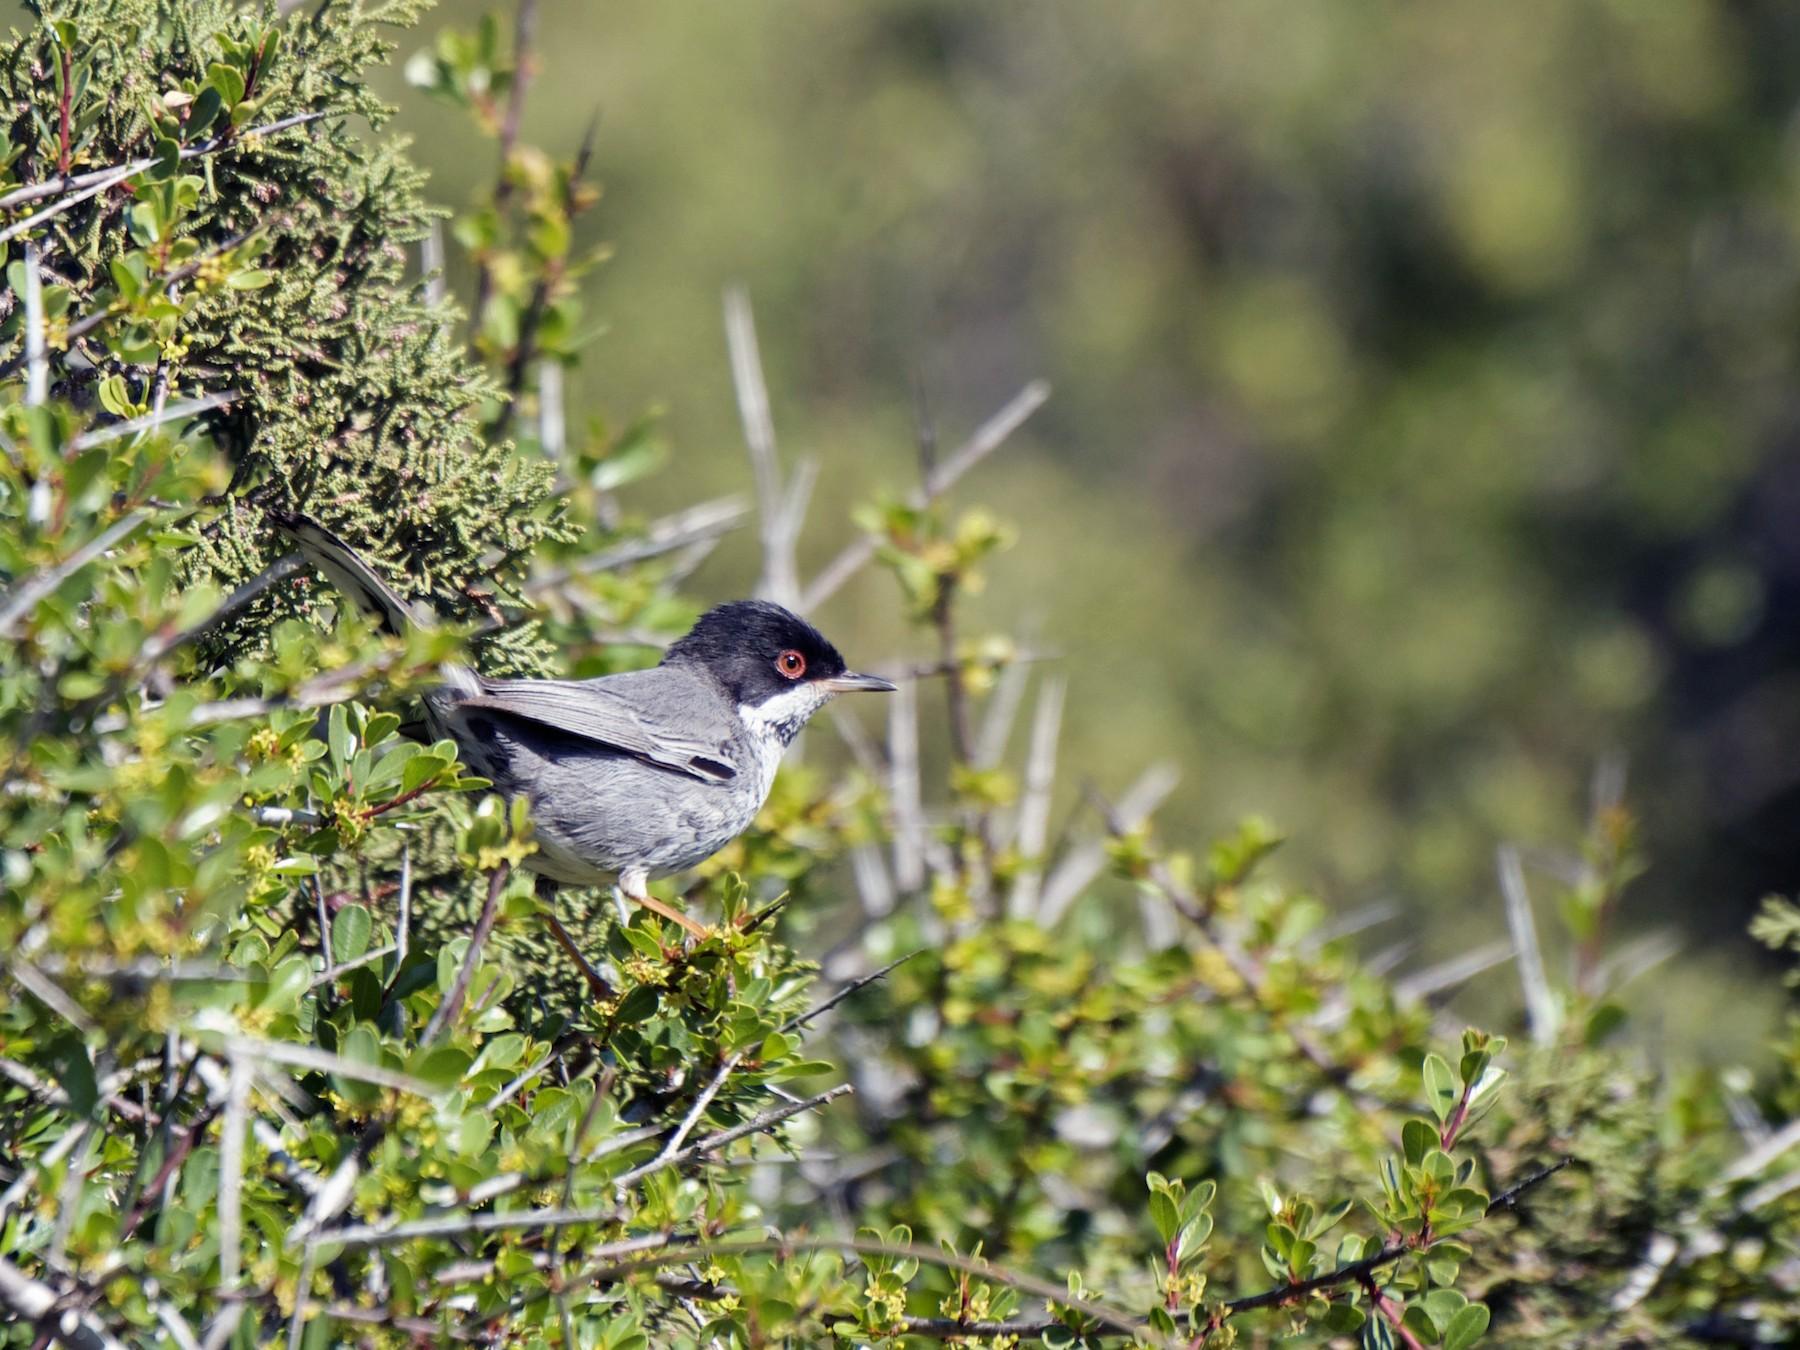 Cyprus Warbler - Aidan Place